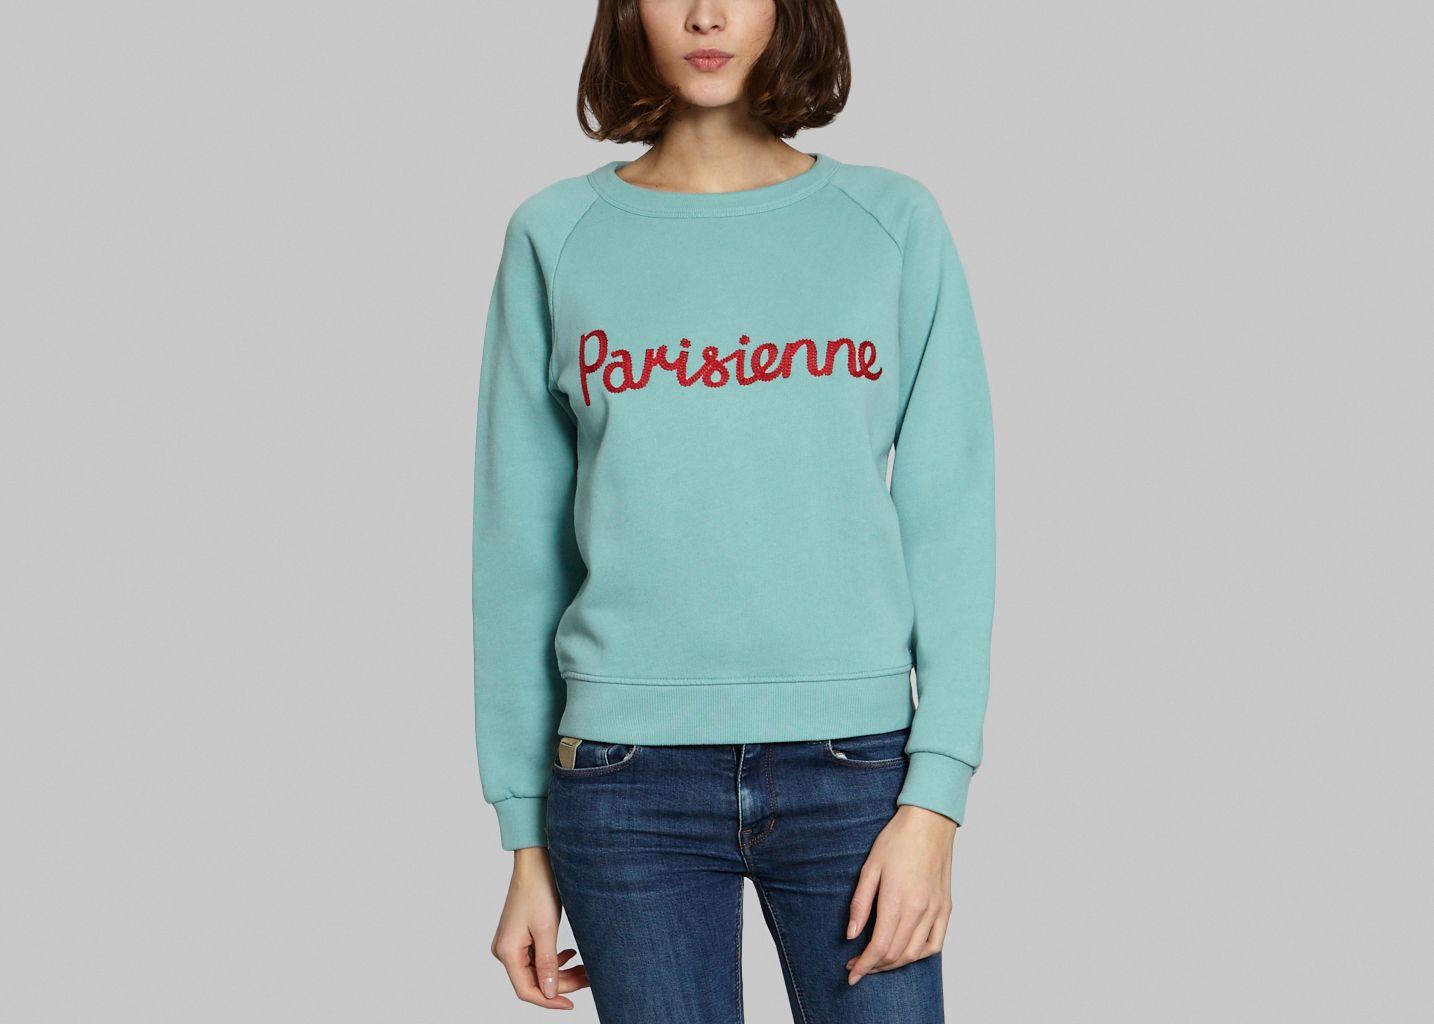 Parisian Sweatshirt - Maison Kitsuné